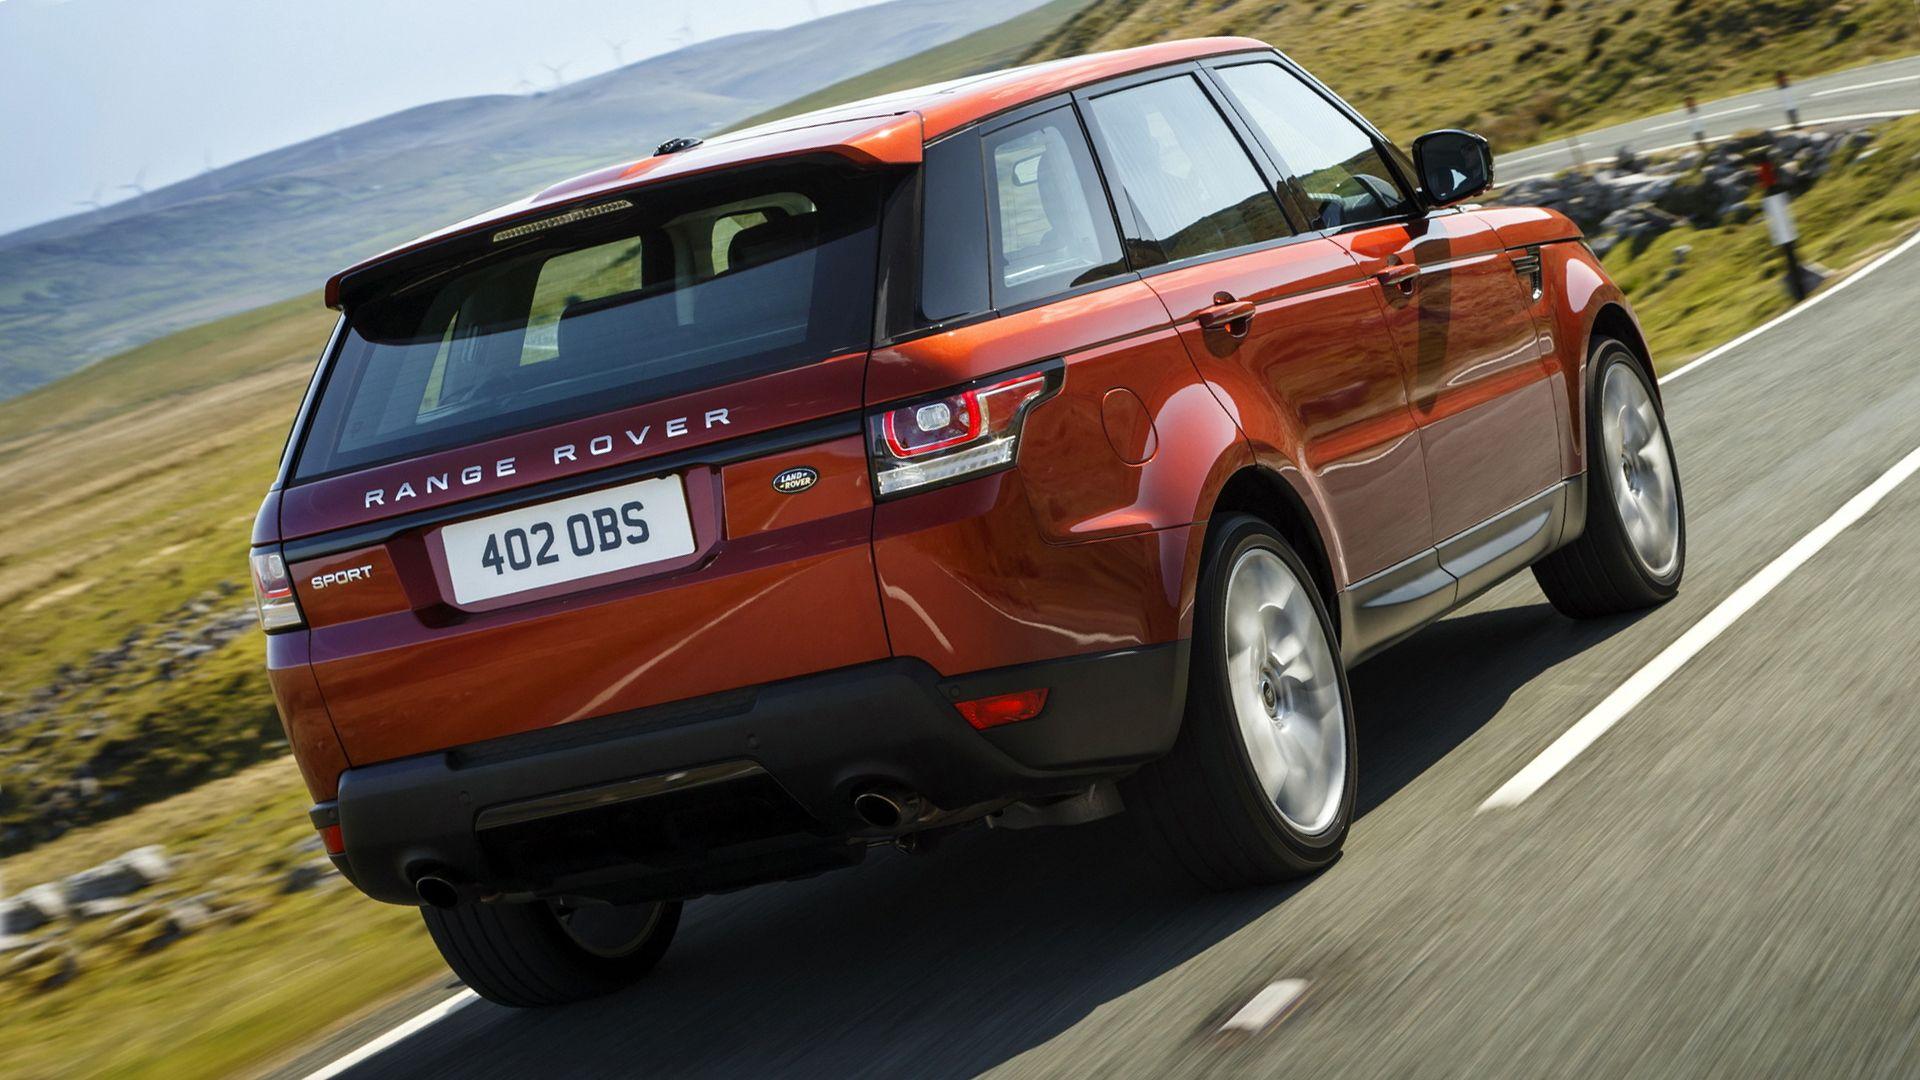 2019 Range Rover Sport Specs Features Range Rover Sport Review Range Rover Sport Range Rover